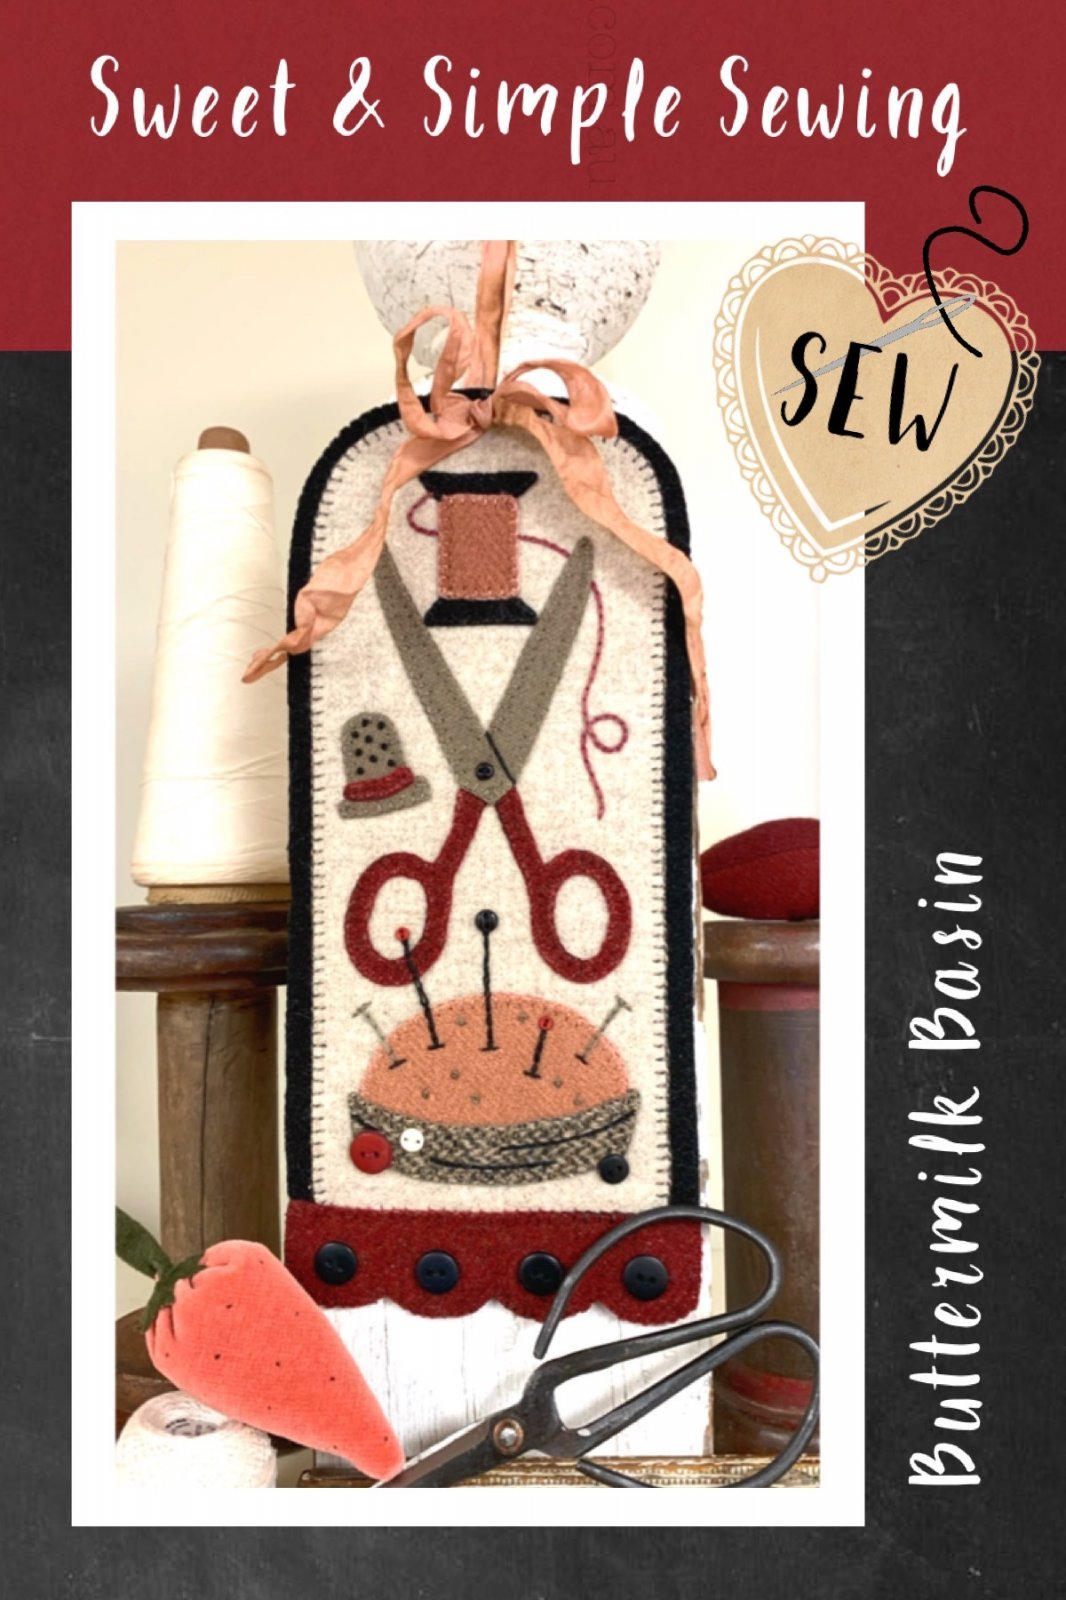 Sweet & Simple Sewing * KIT & Pattern